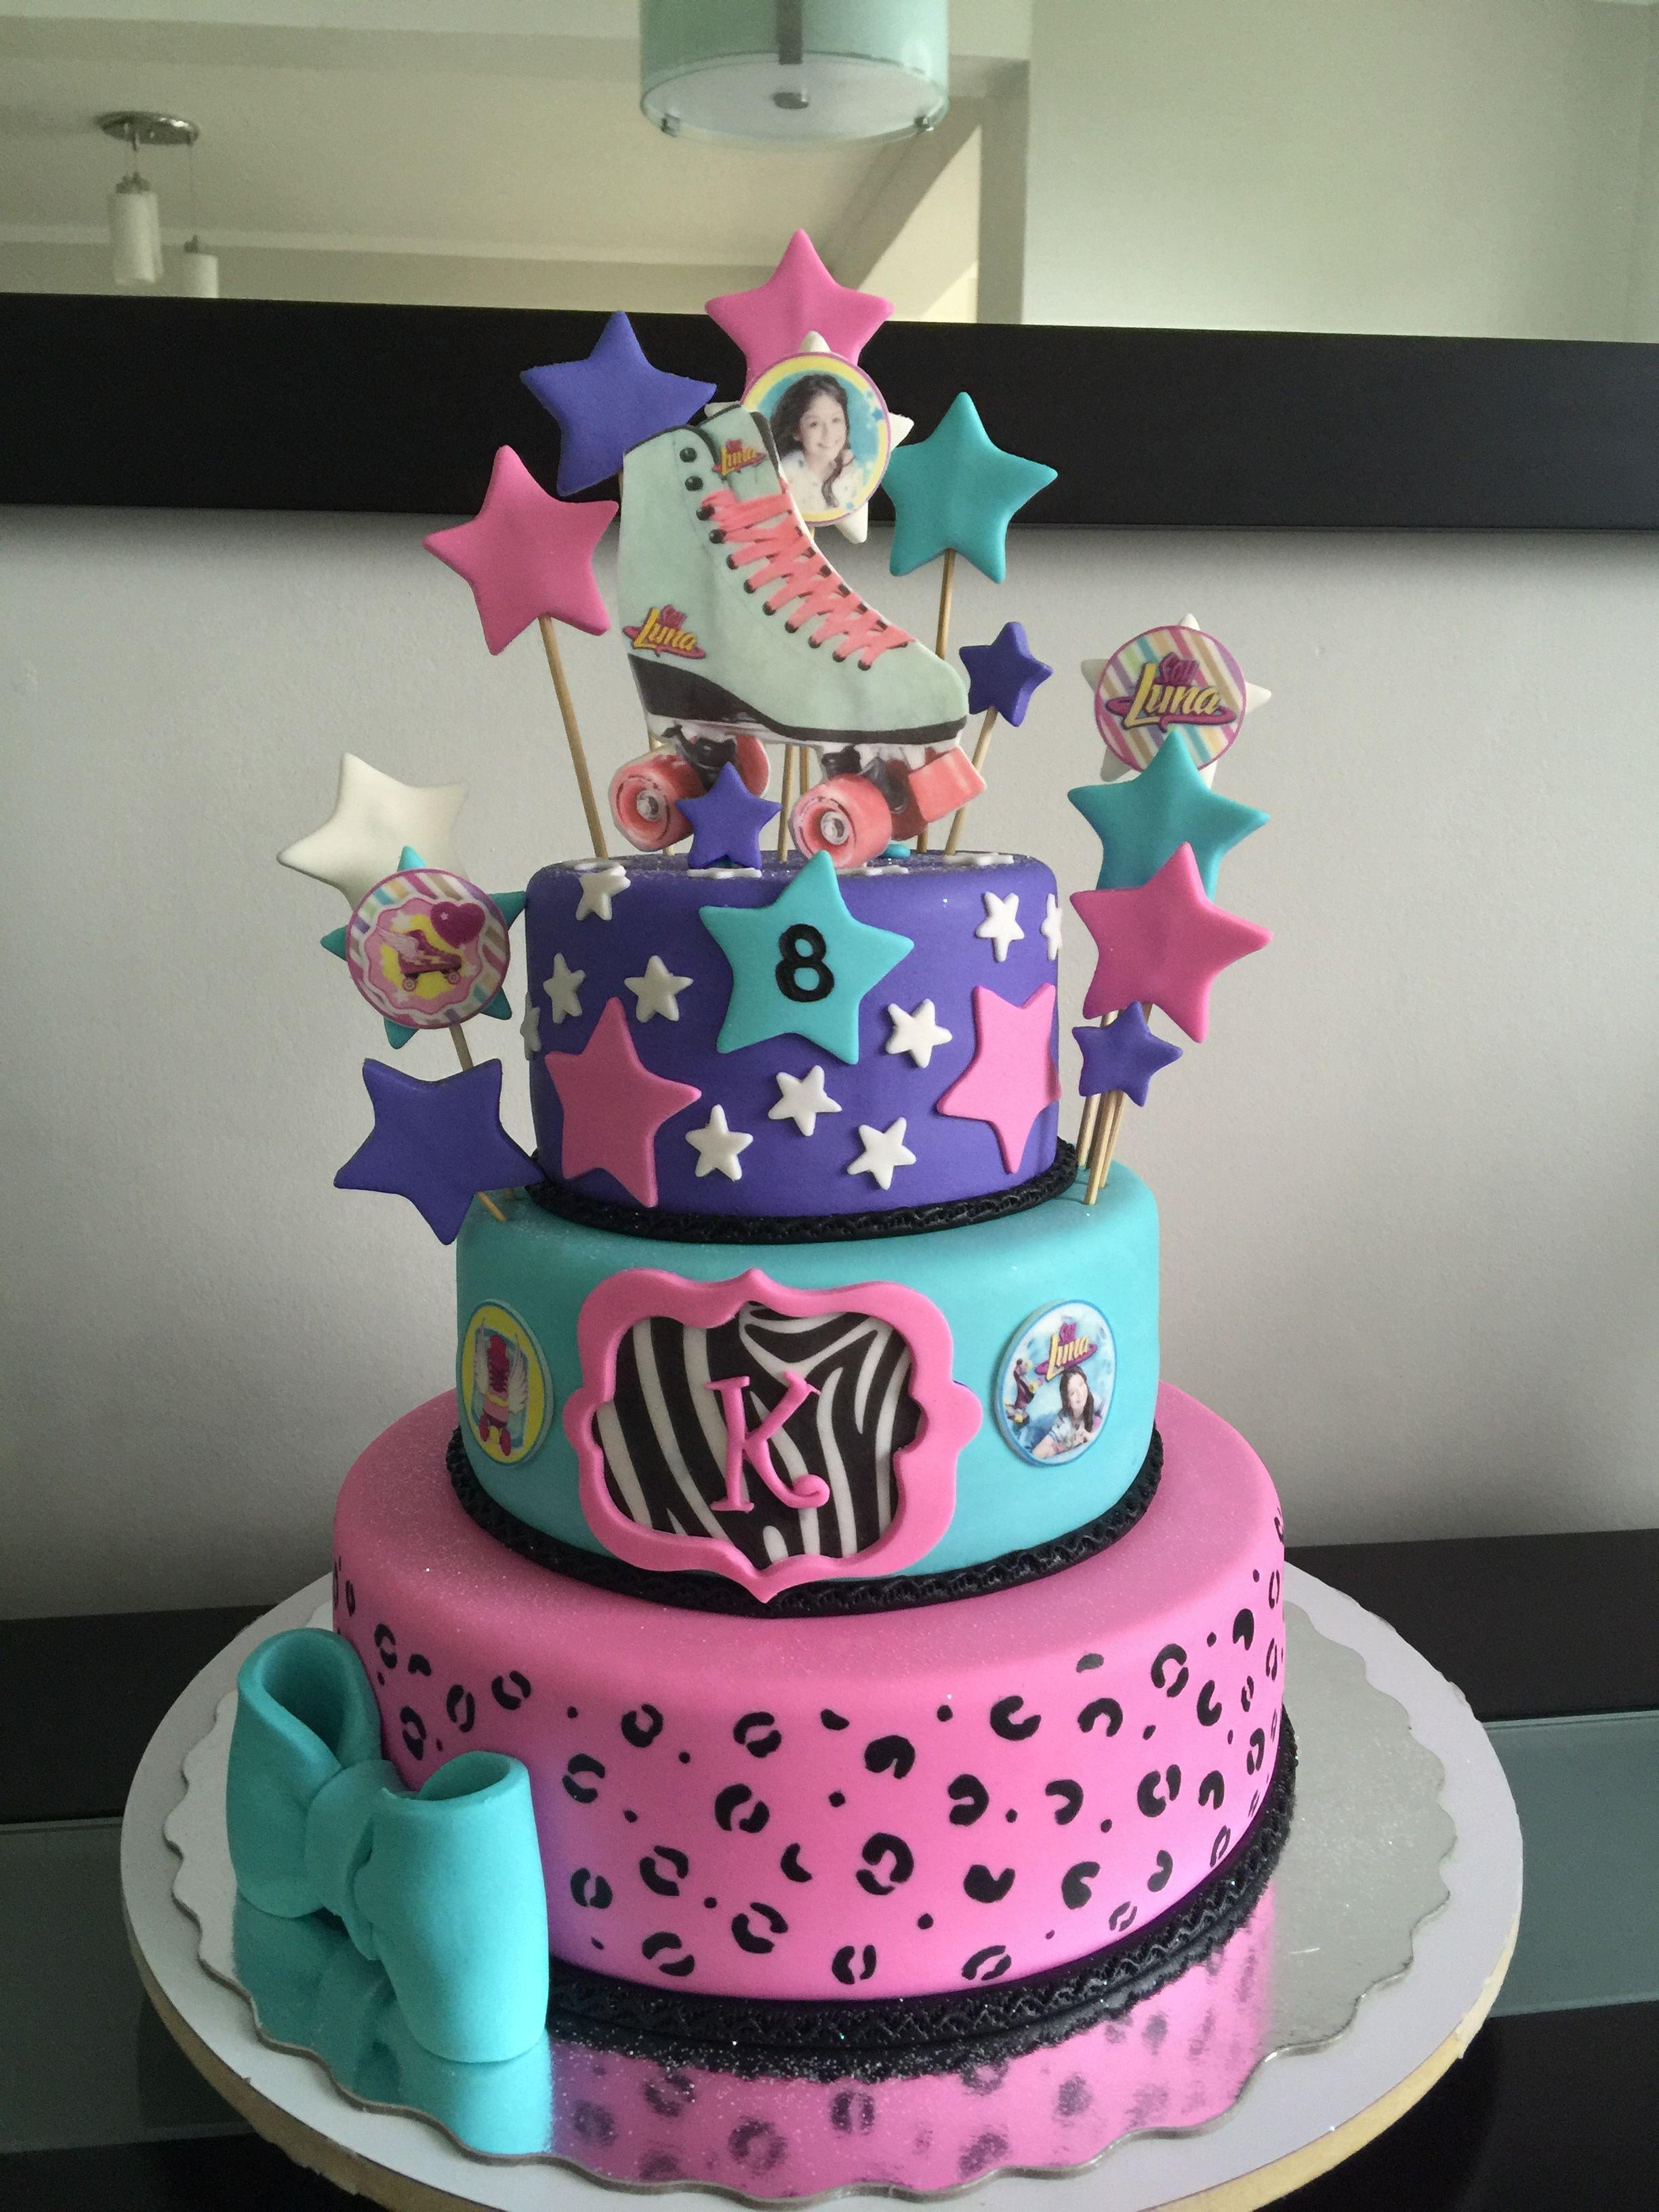 Cake soy luna pineapple cake pasteles para ni os de - Bizcocho cumpleanos para ninos ...